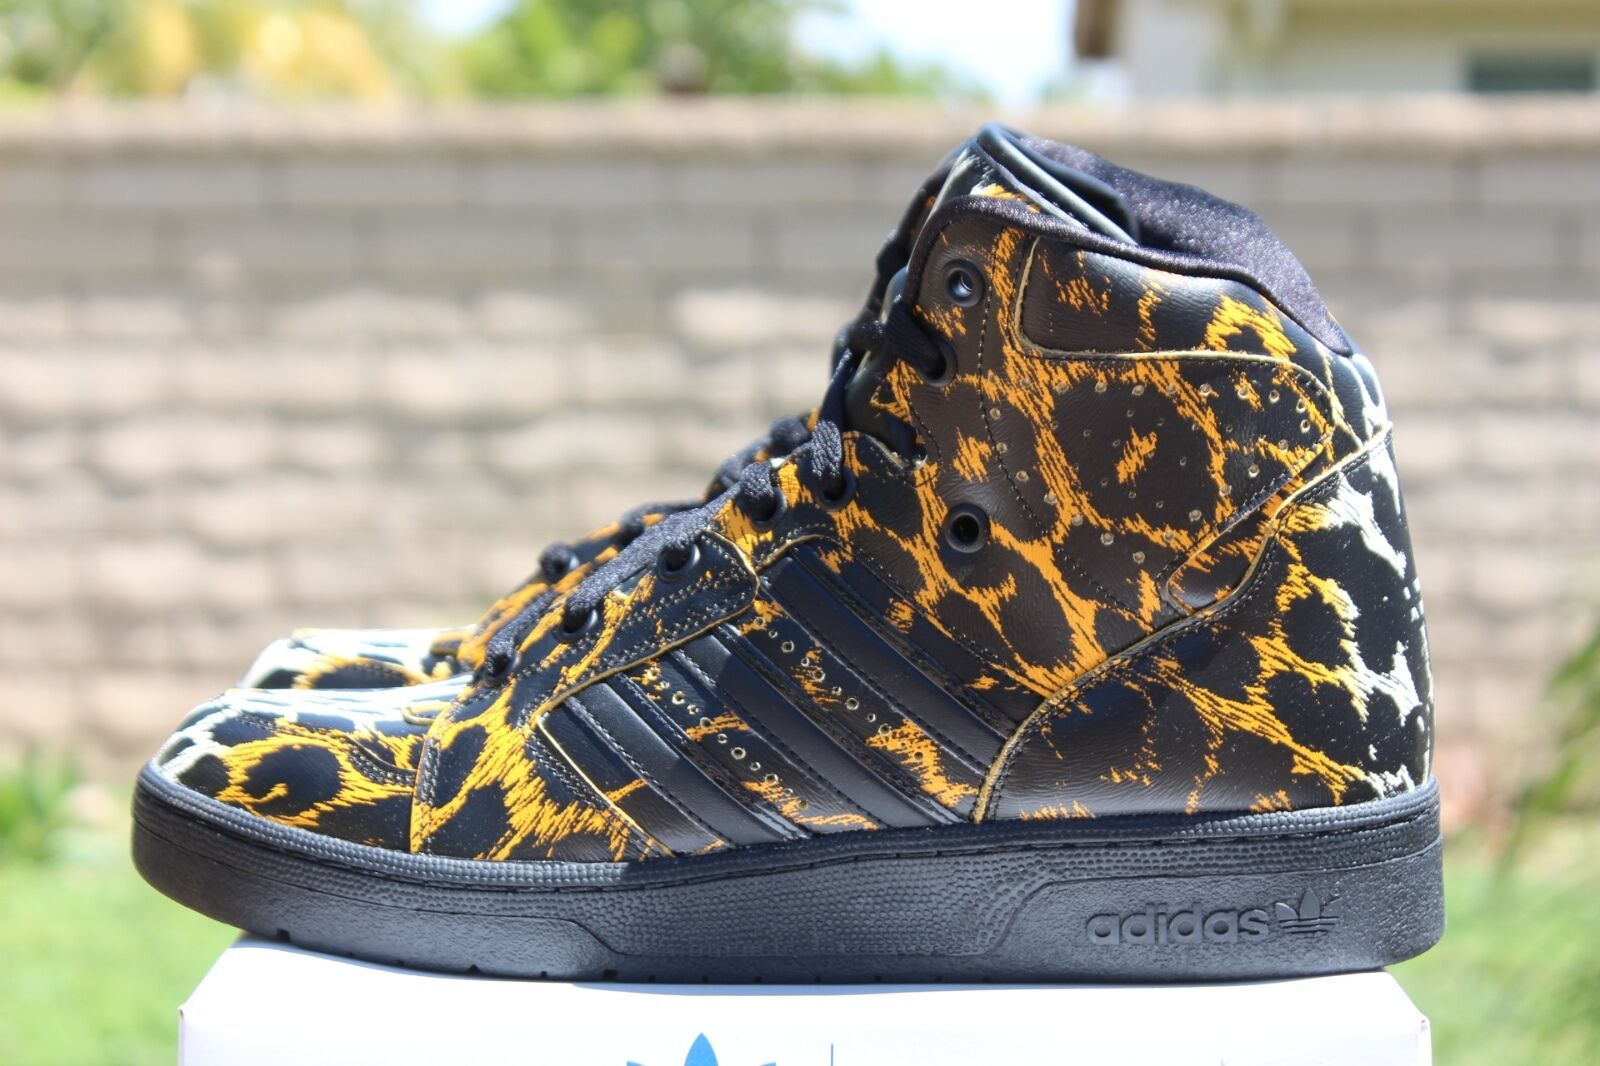 ADIDAS ObyO JS JEREMY SCOTT INSTINCT Leopardo HI tamaño 4 Negro Cheetah D65985